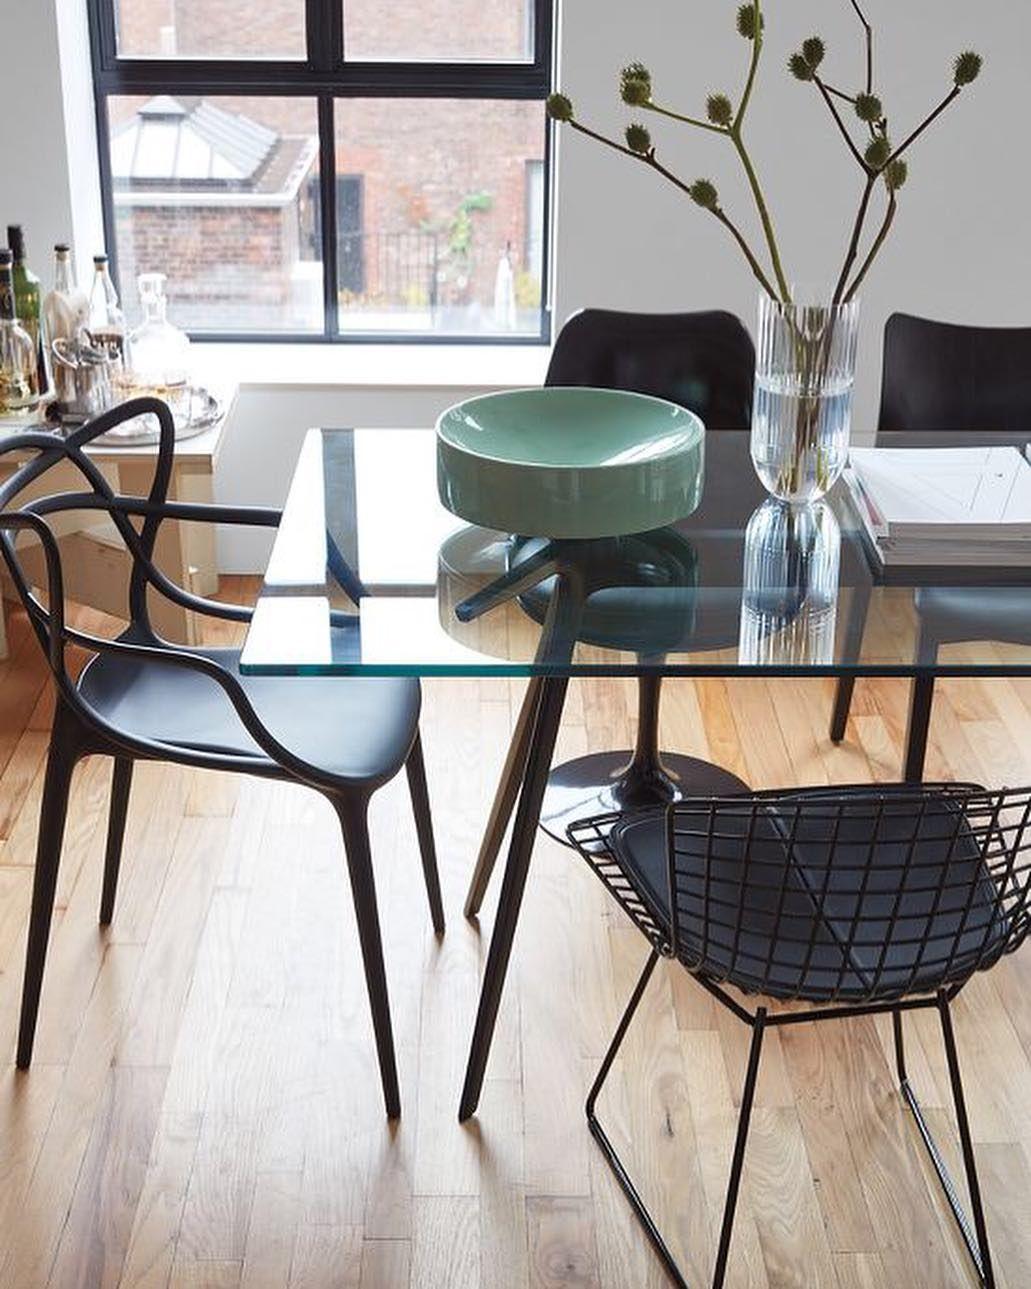 Philippe Starck Design Stoelen.Masters Chair Kartell Replica Philippe Starck Kartell Stoelen Tafel